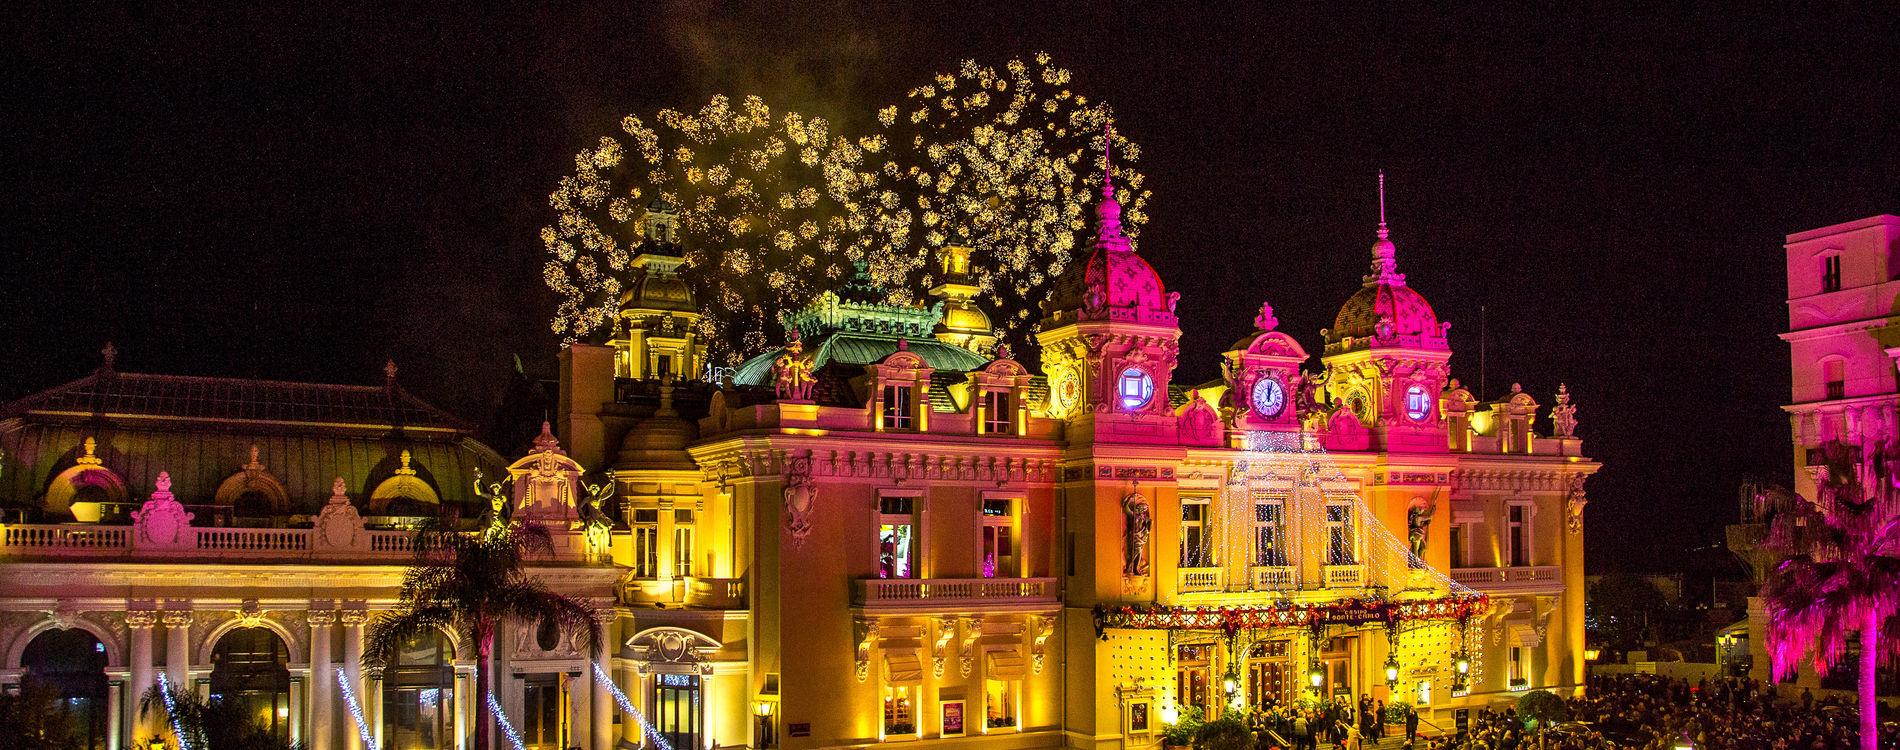 Casino de Monte-Carlo - Evenement spécial - Noël